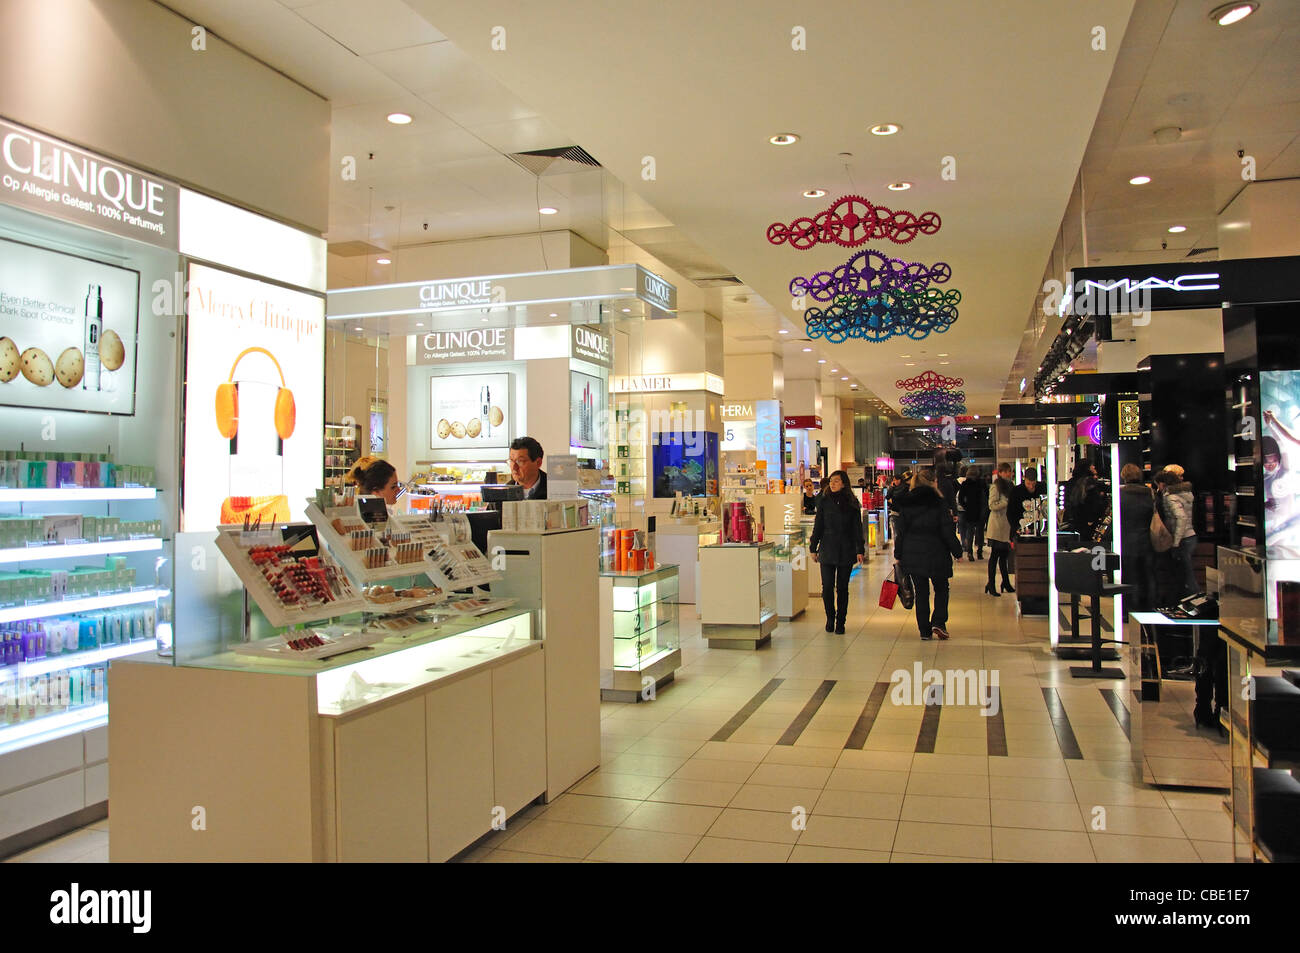 Interior of De Bijenkorf department store, Damrak, Amsterdam, Noord-Holland, Kingdom of the Netherlands - Stock Image